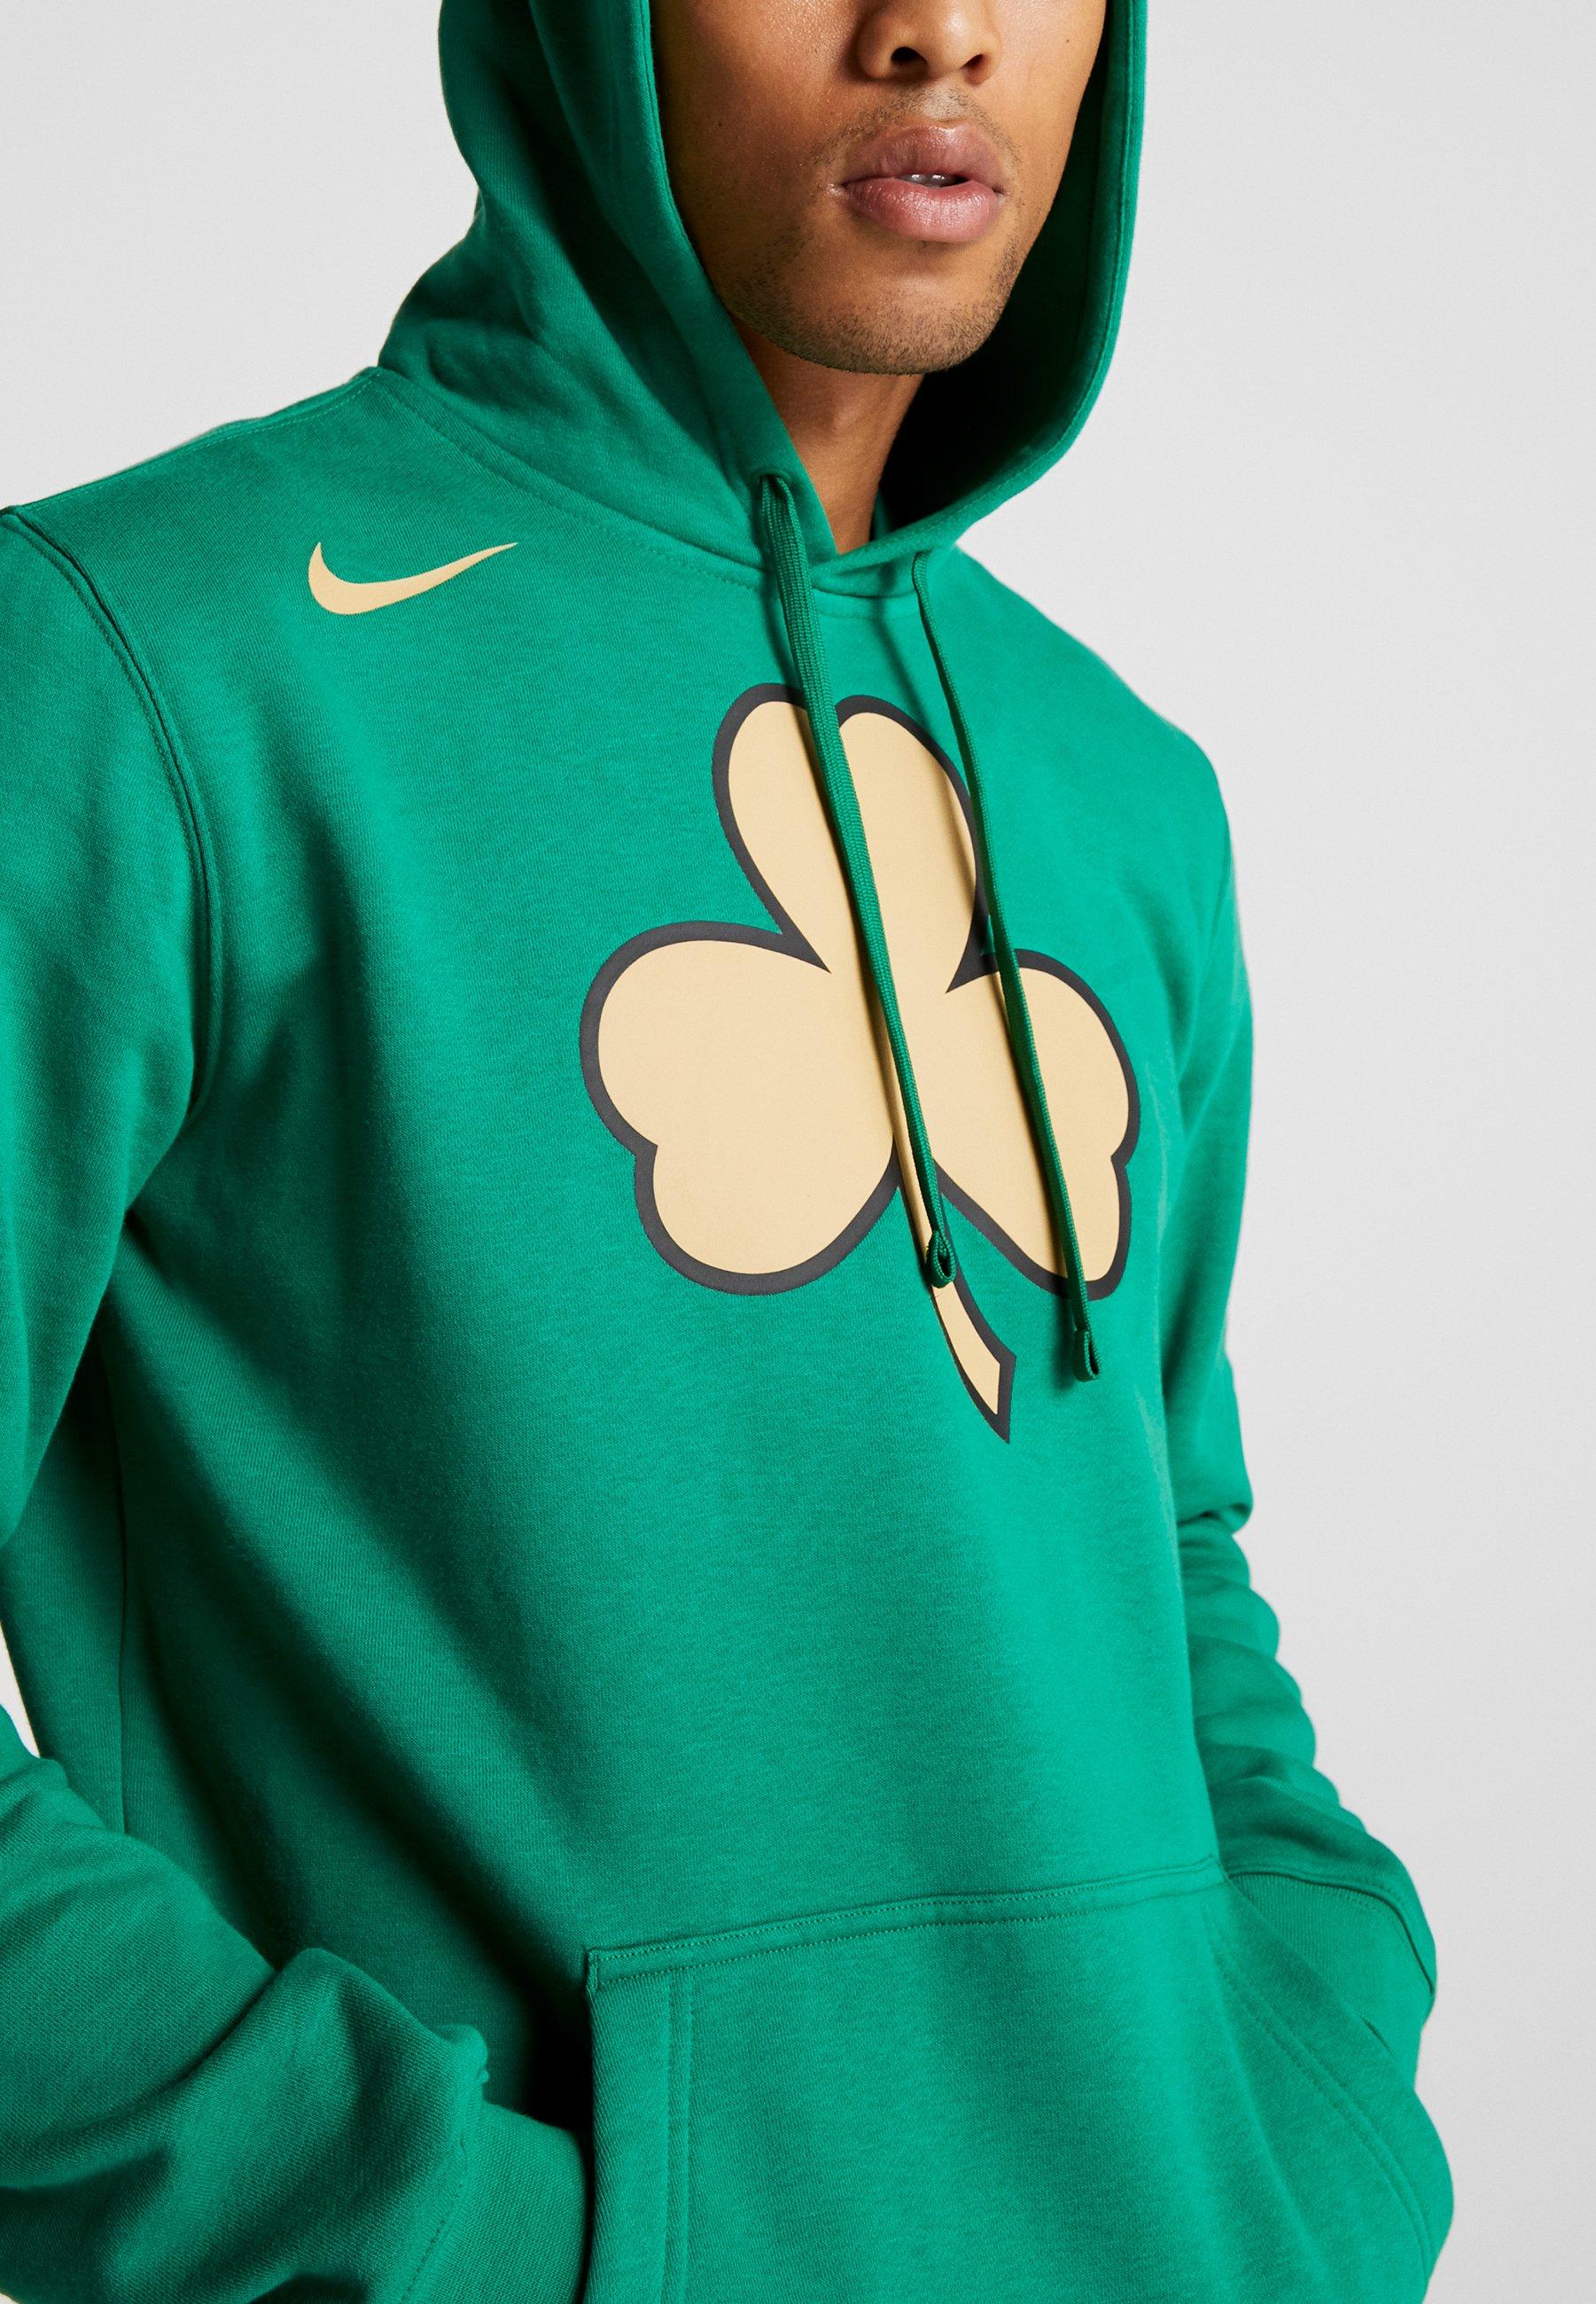 Nike Performance NBA CITY EDITION BOSTON CELTICS LOGO HOODIE - Artykuły klubowe - clover